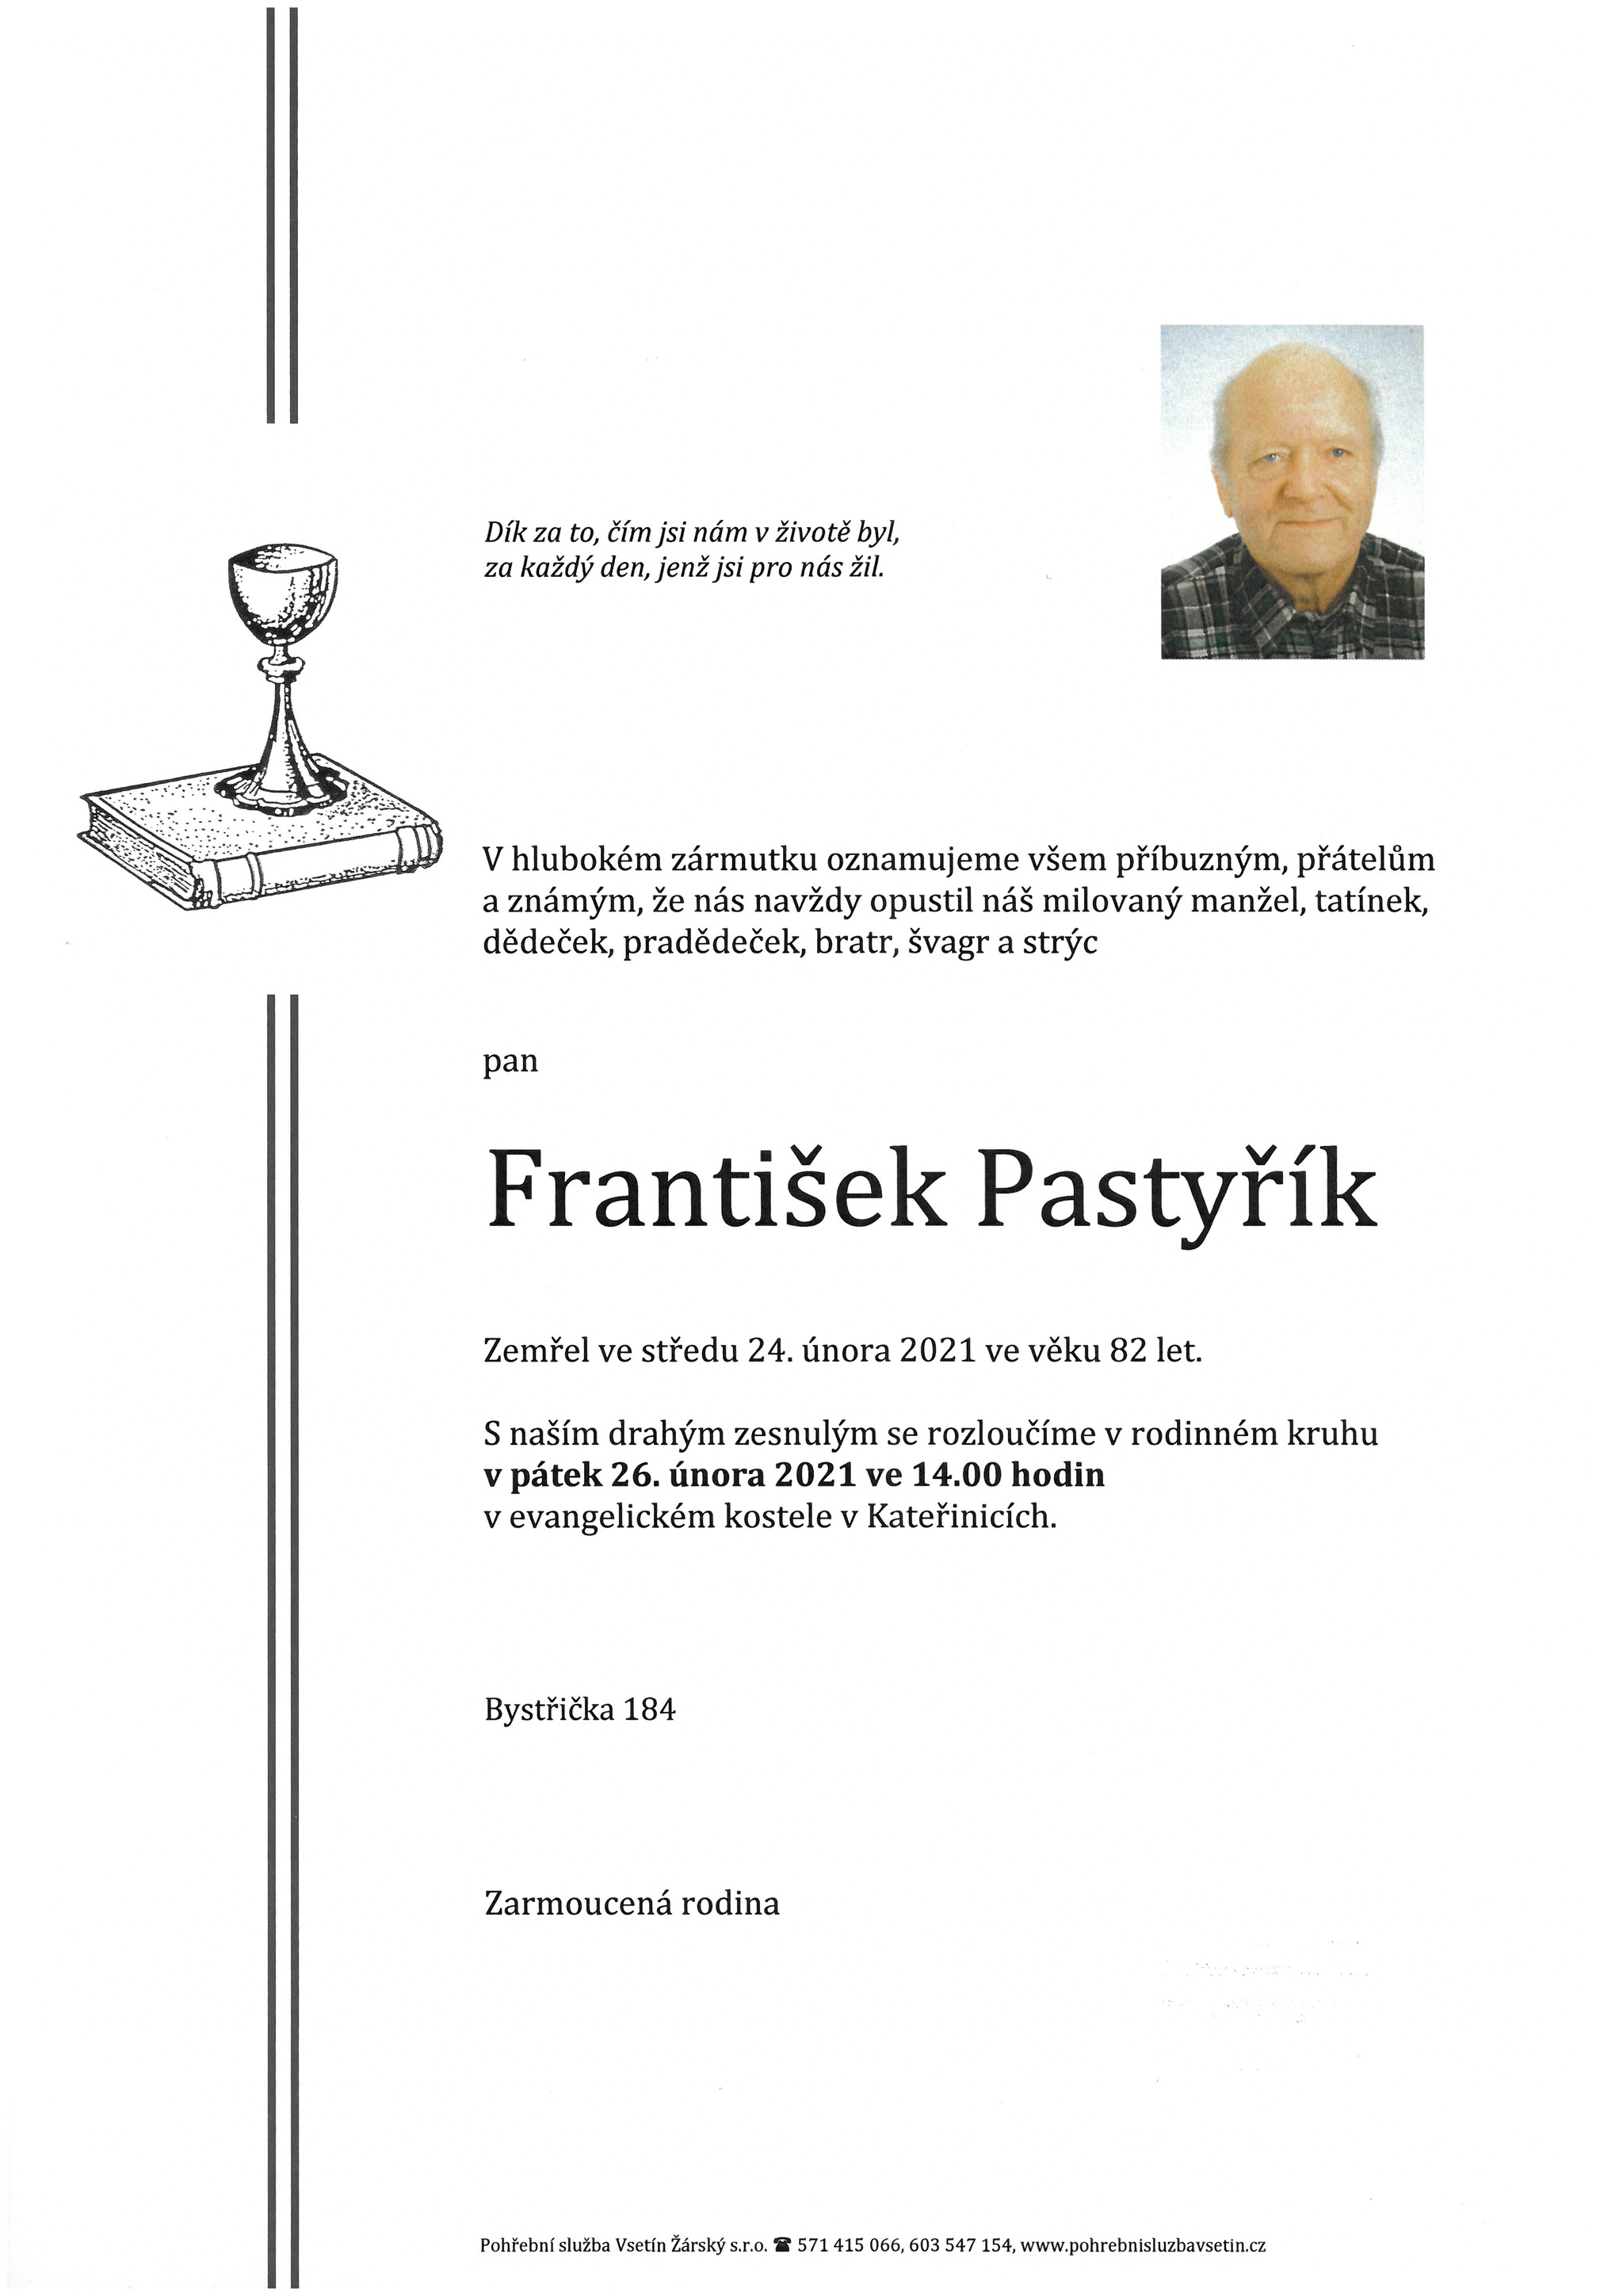 František Pastyřík